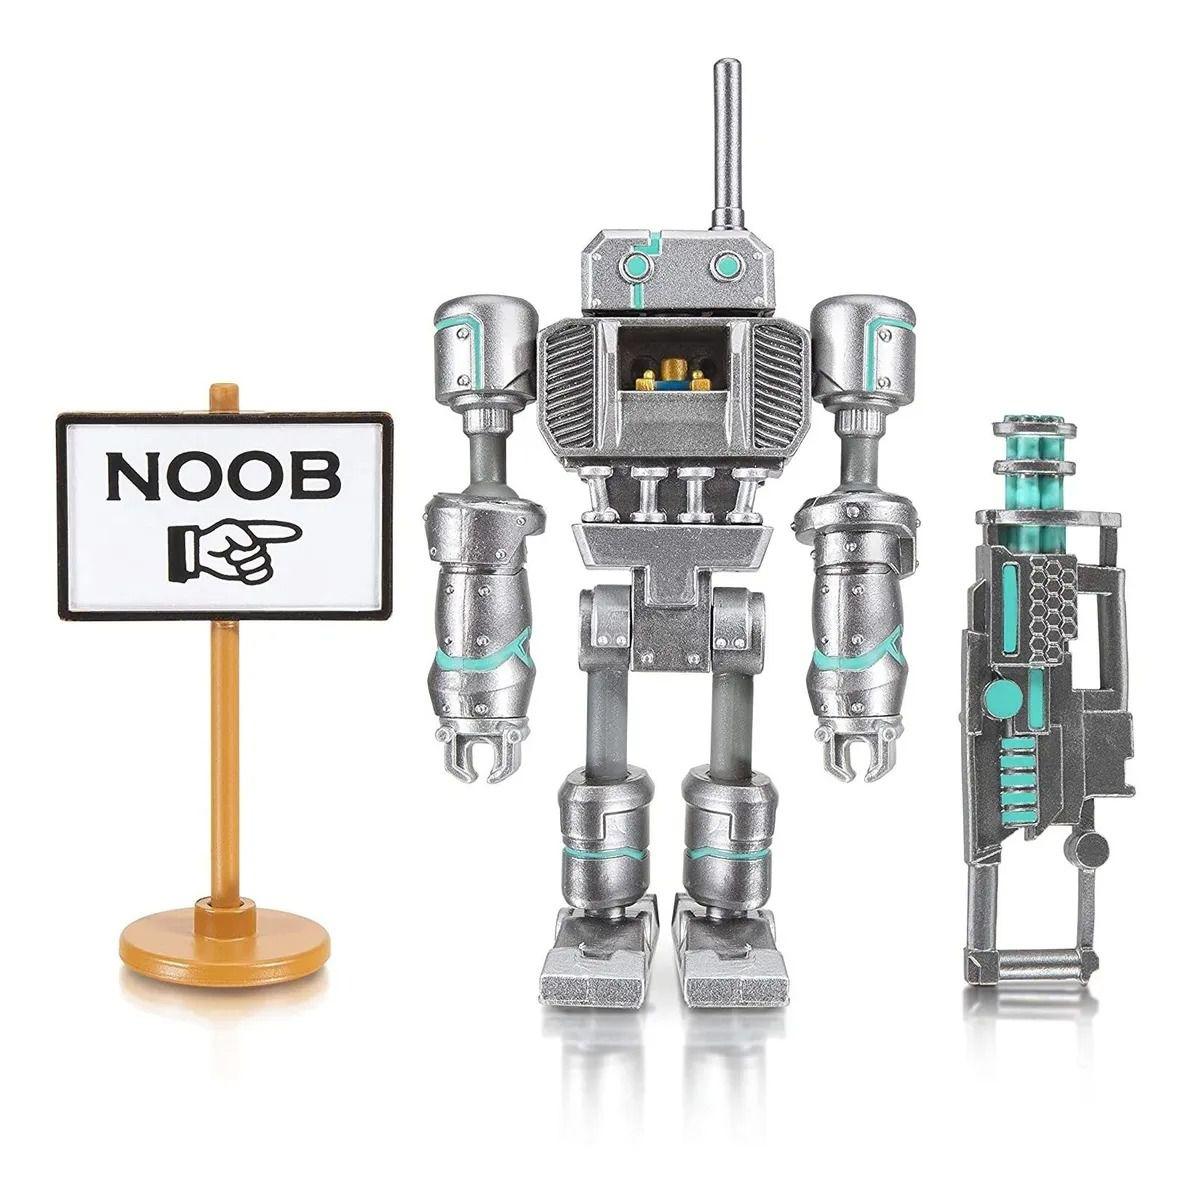 Roblox Boneco Articulado Noob Attack C/ Acessórios e Código Virtual - Sunny